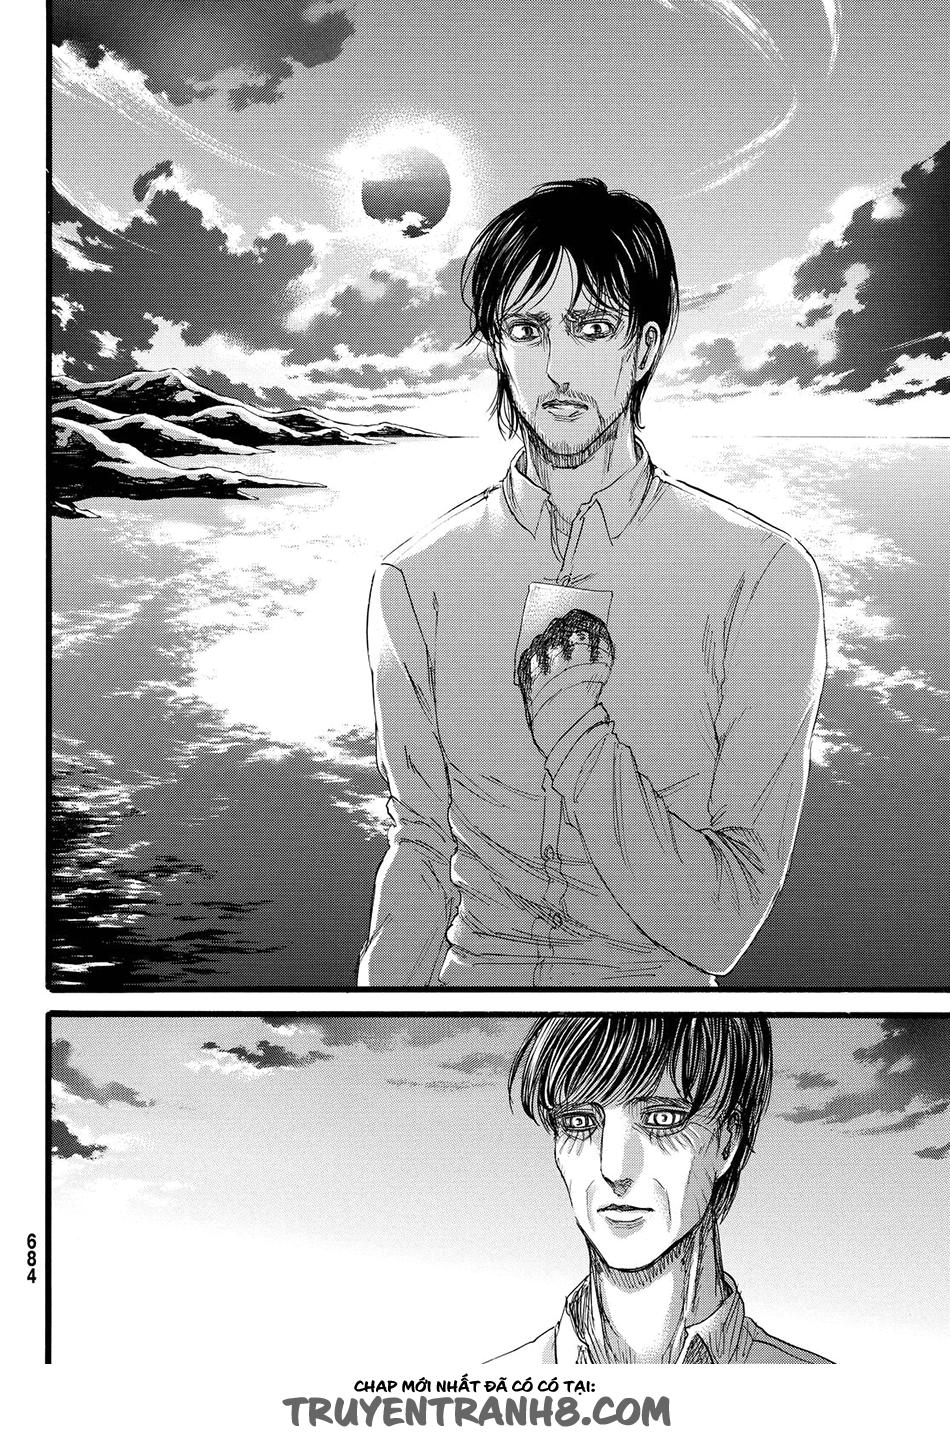 Shingeki no Kyojin - Attack on Titan Chap 88 page 42 Congtruyen24h